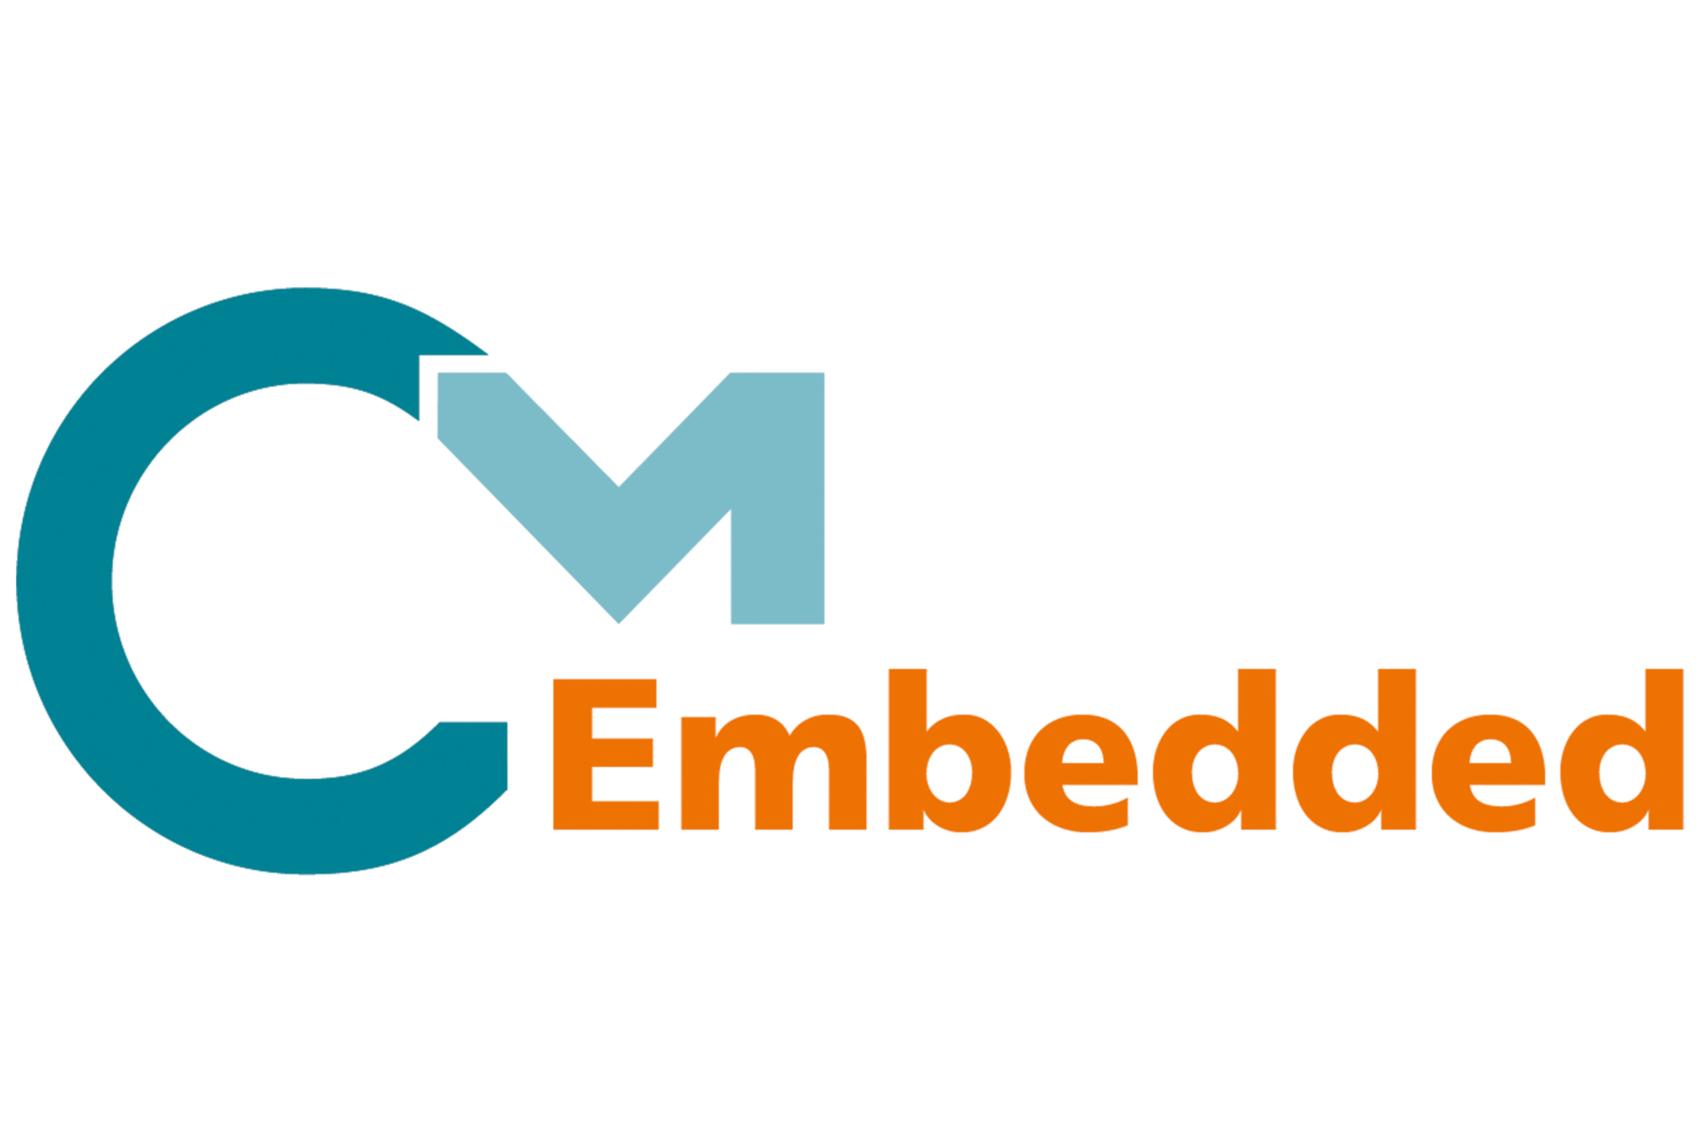 CodeMeter Embedded